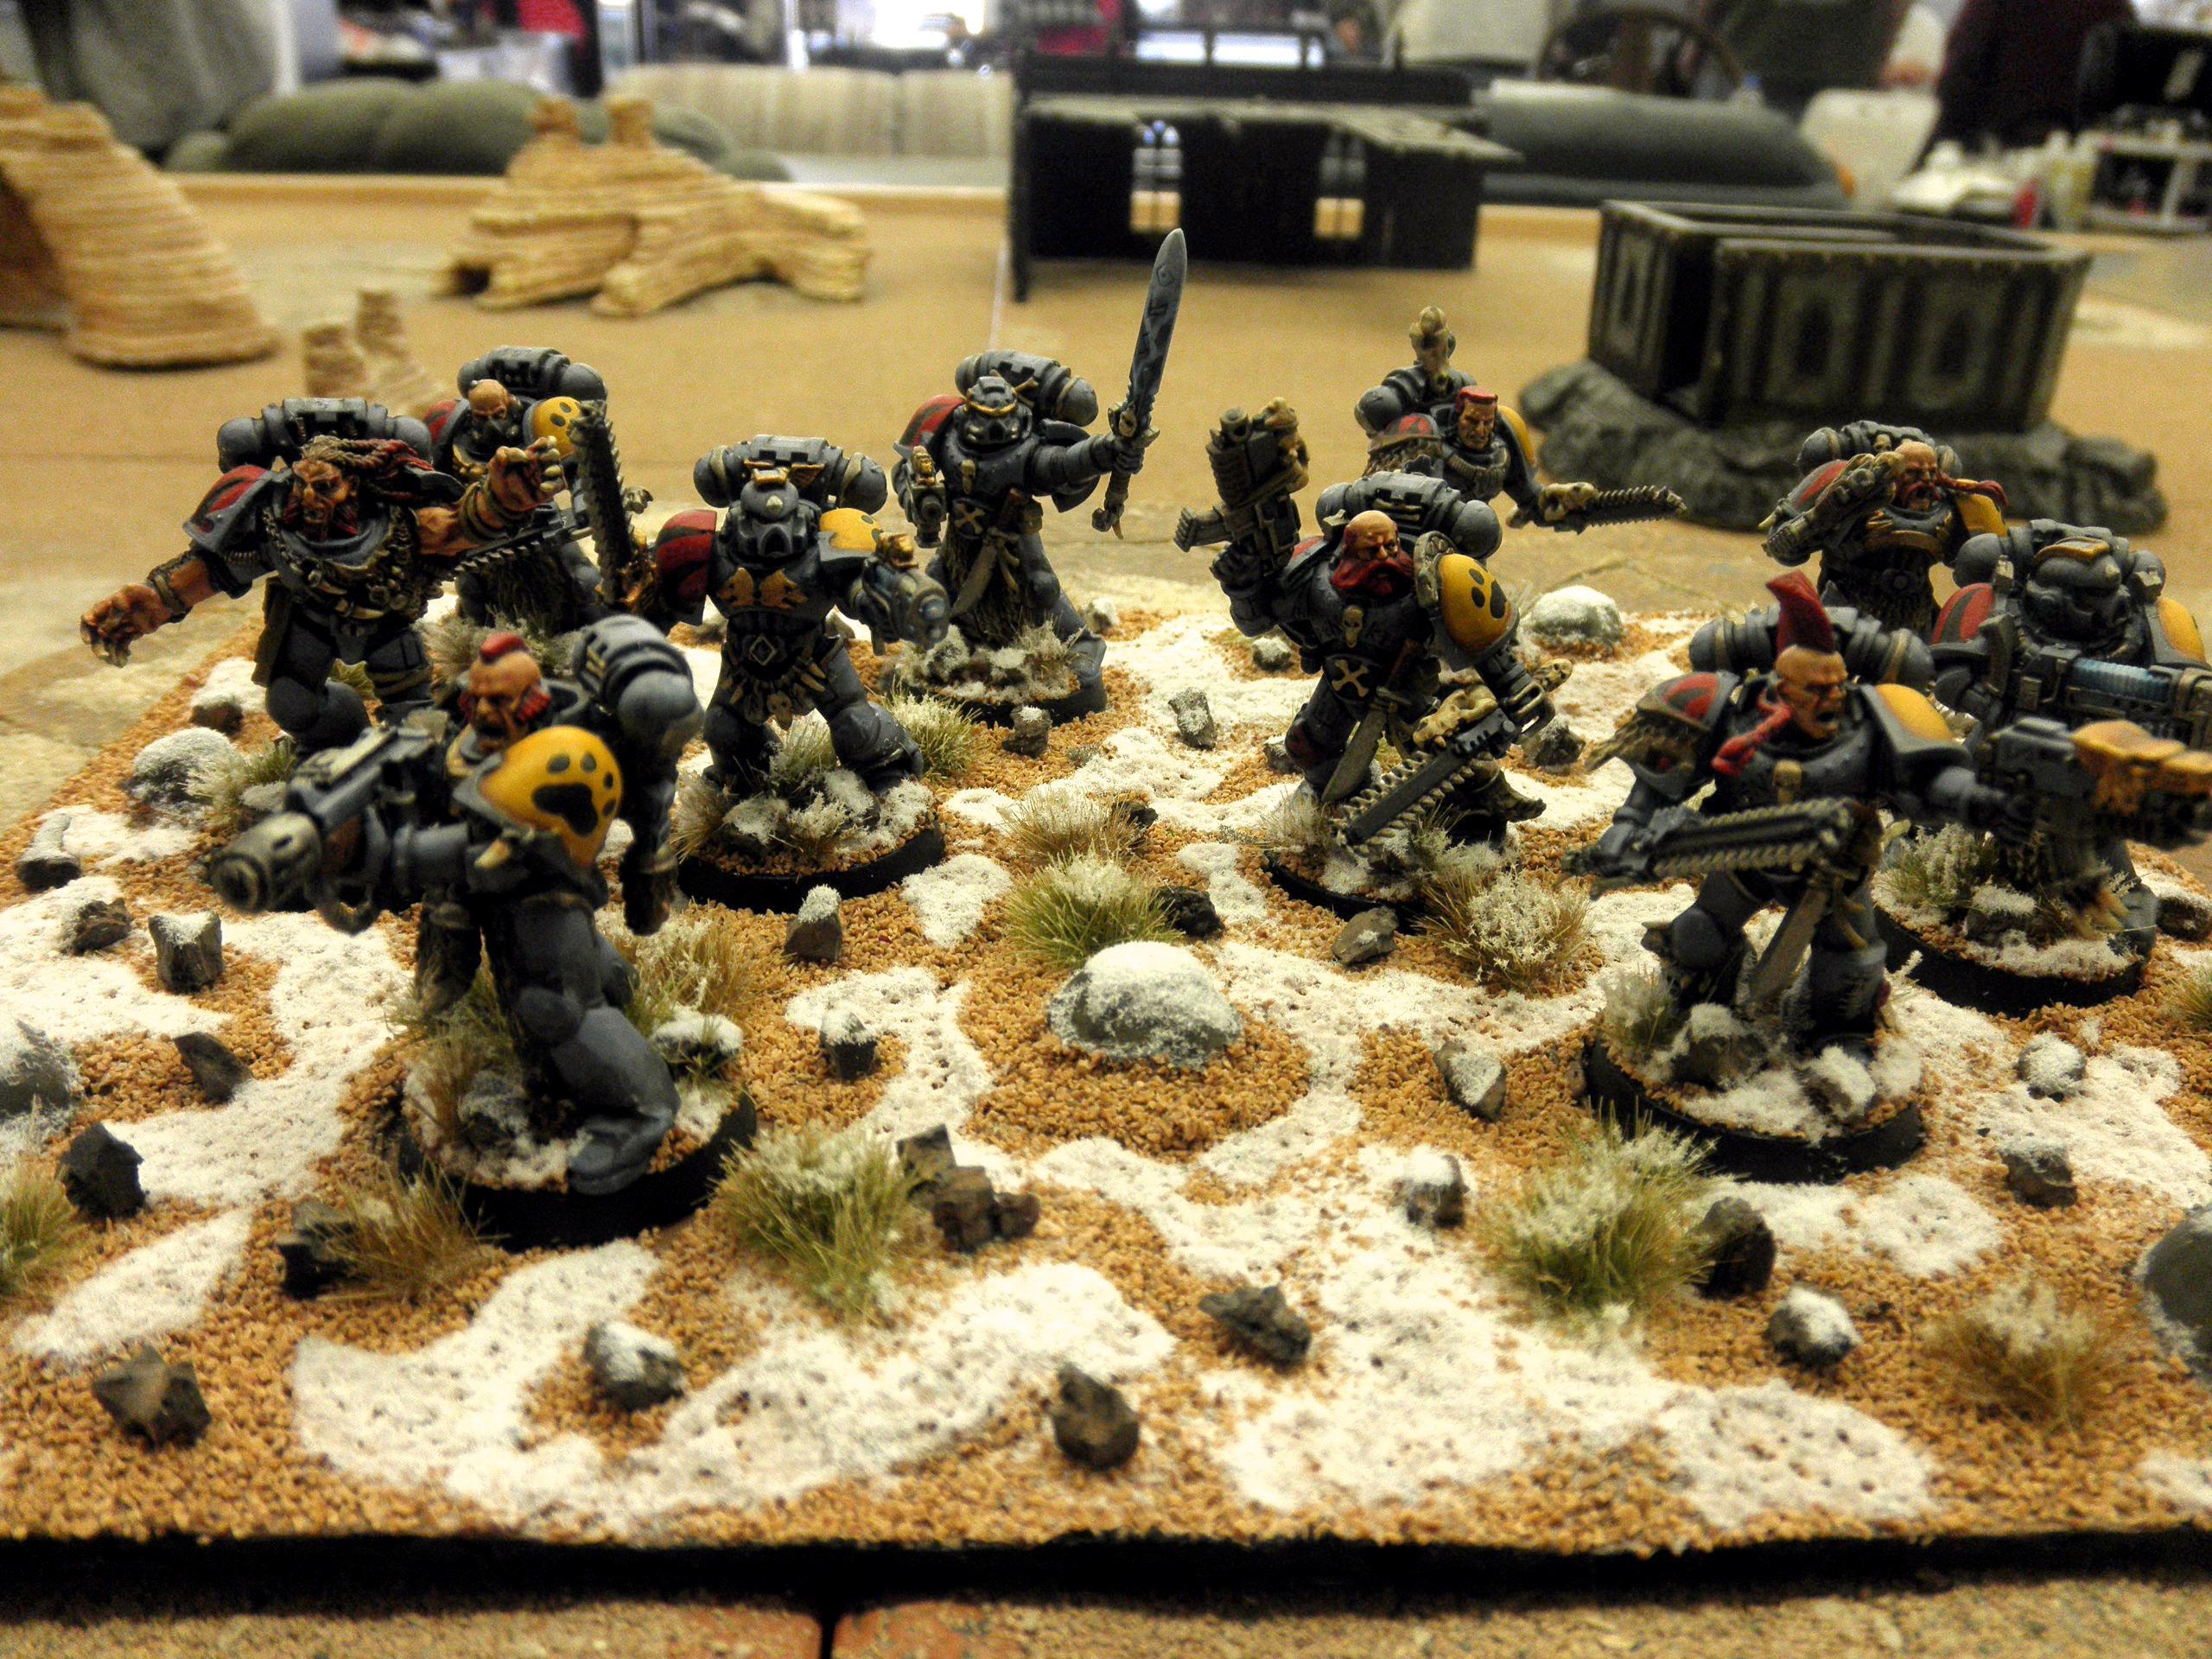 Painted, Space Marines, Space Wolves, Troops, Warhammer 40,000, Warhammer Fantasy